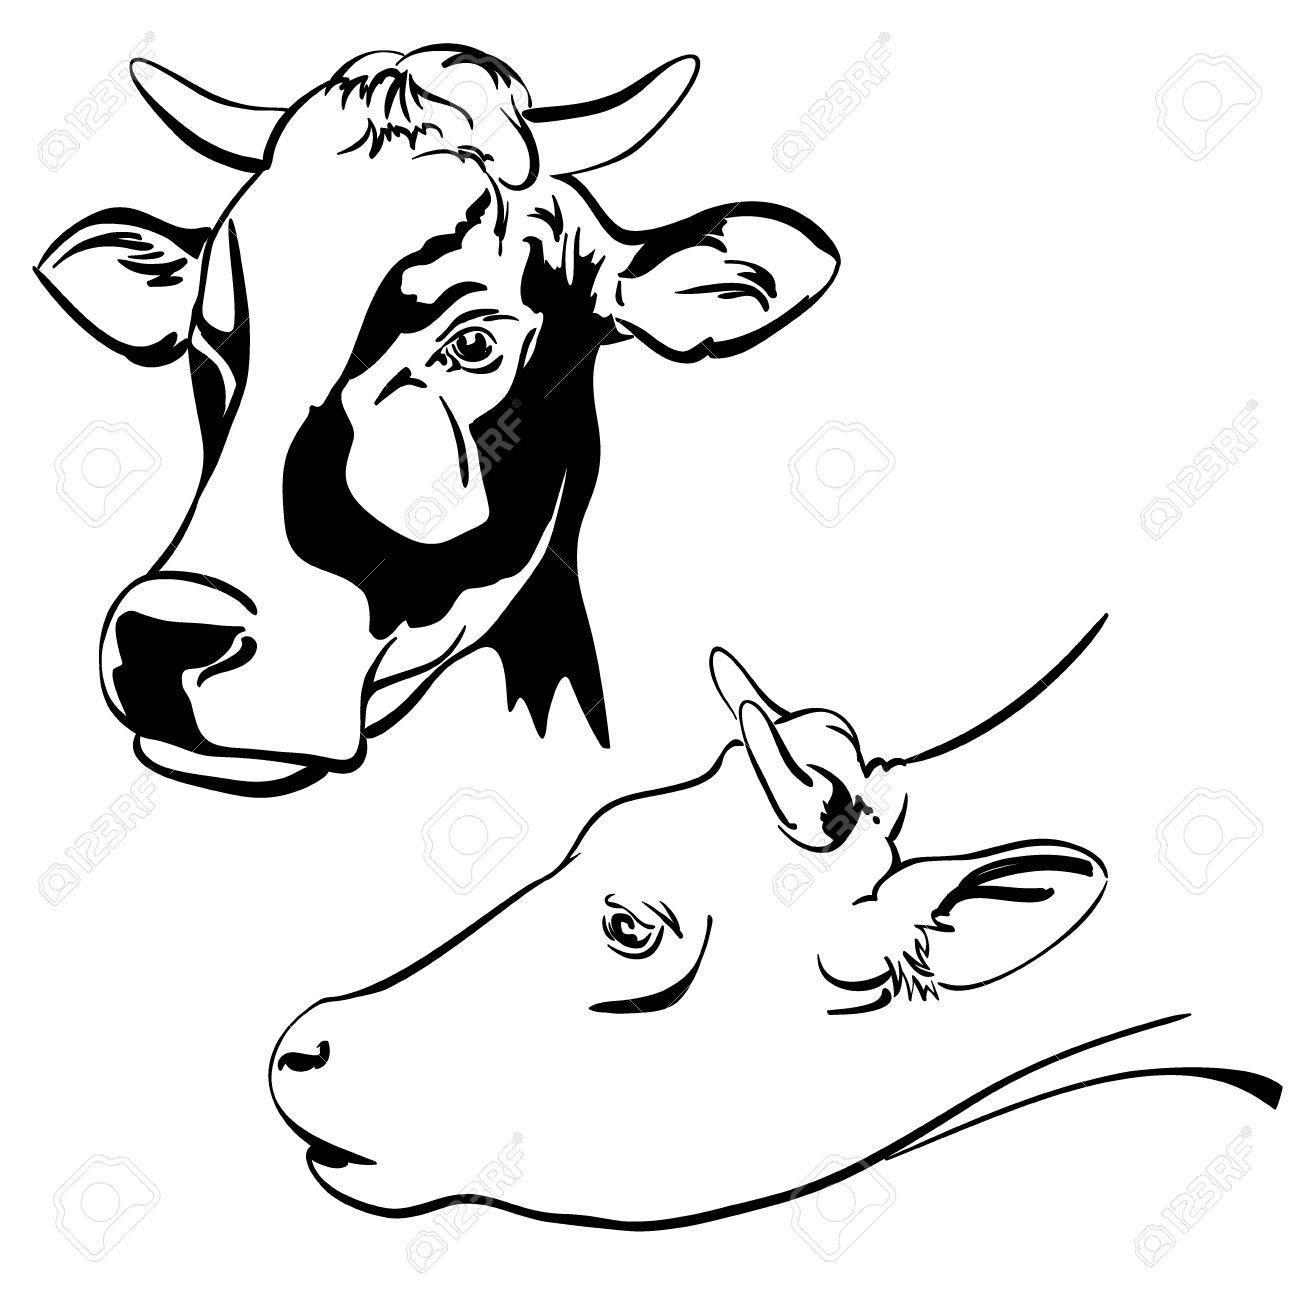 1300x1300 Cow Set Cartoon Vector Illustration Sketch Royalty Free Cliparts